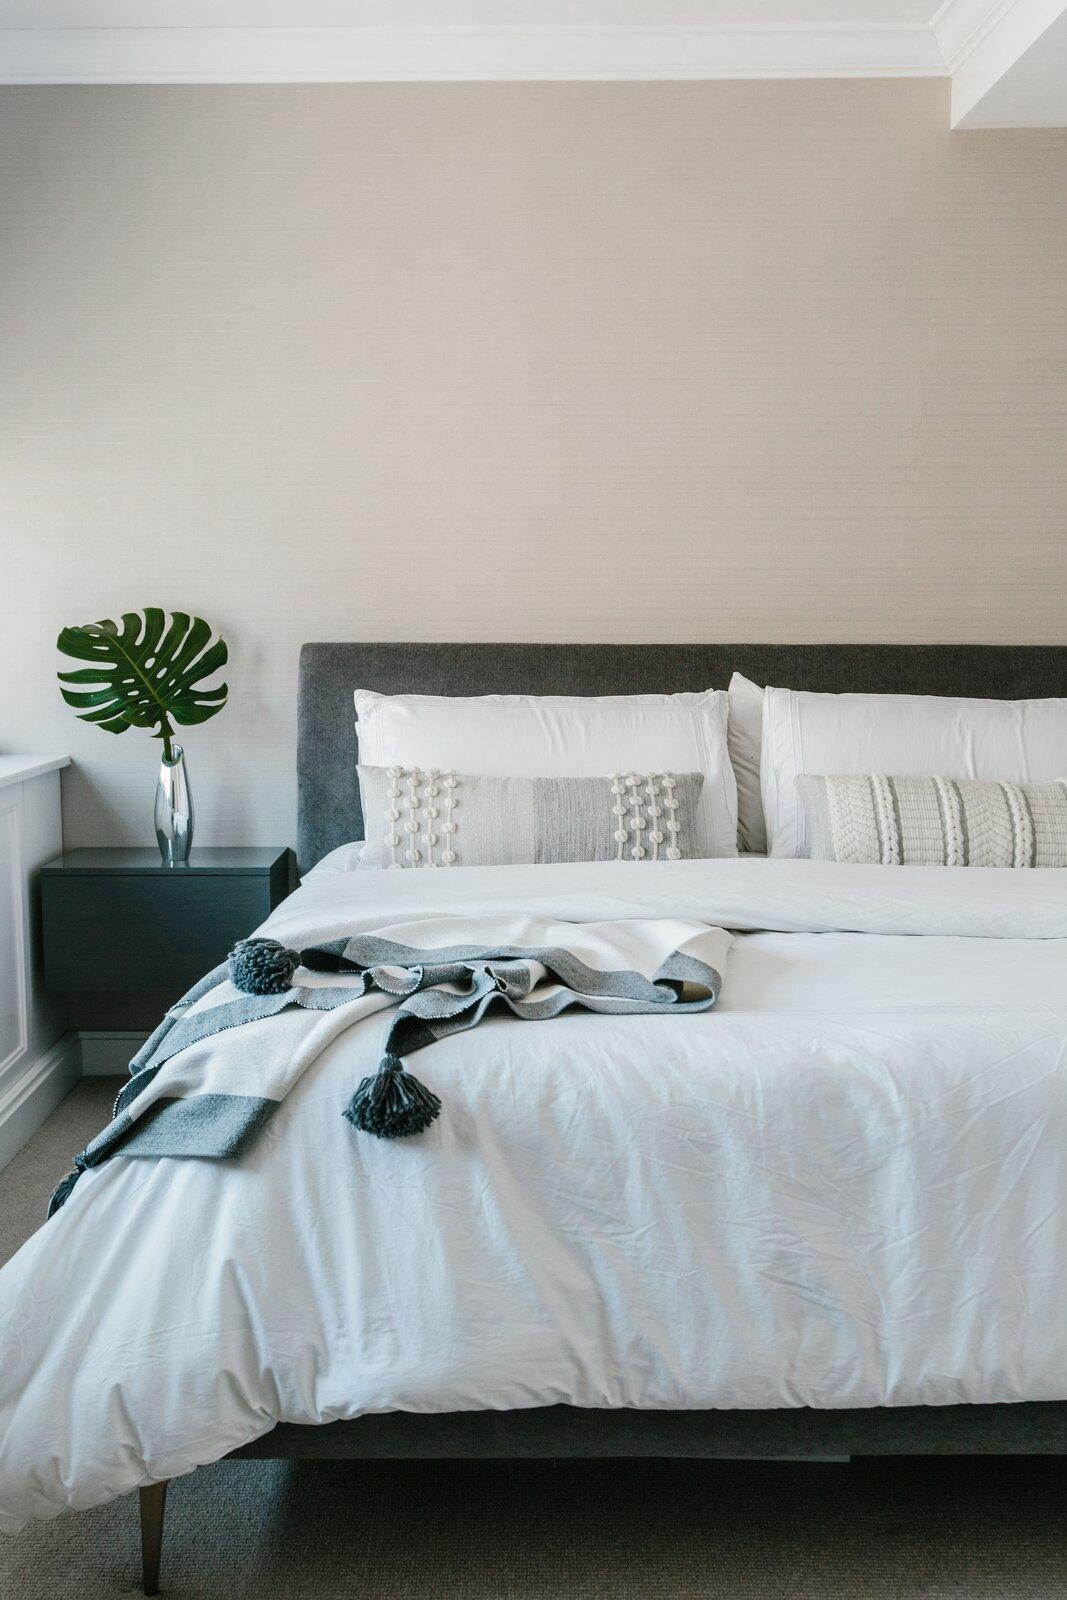 Glassman/Soloman Project by Margaret Costello bedroom